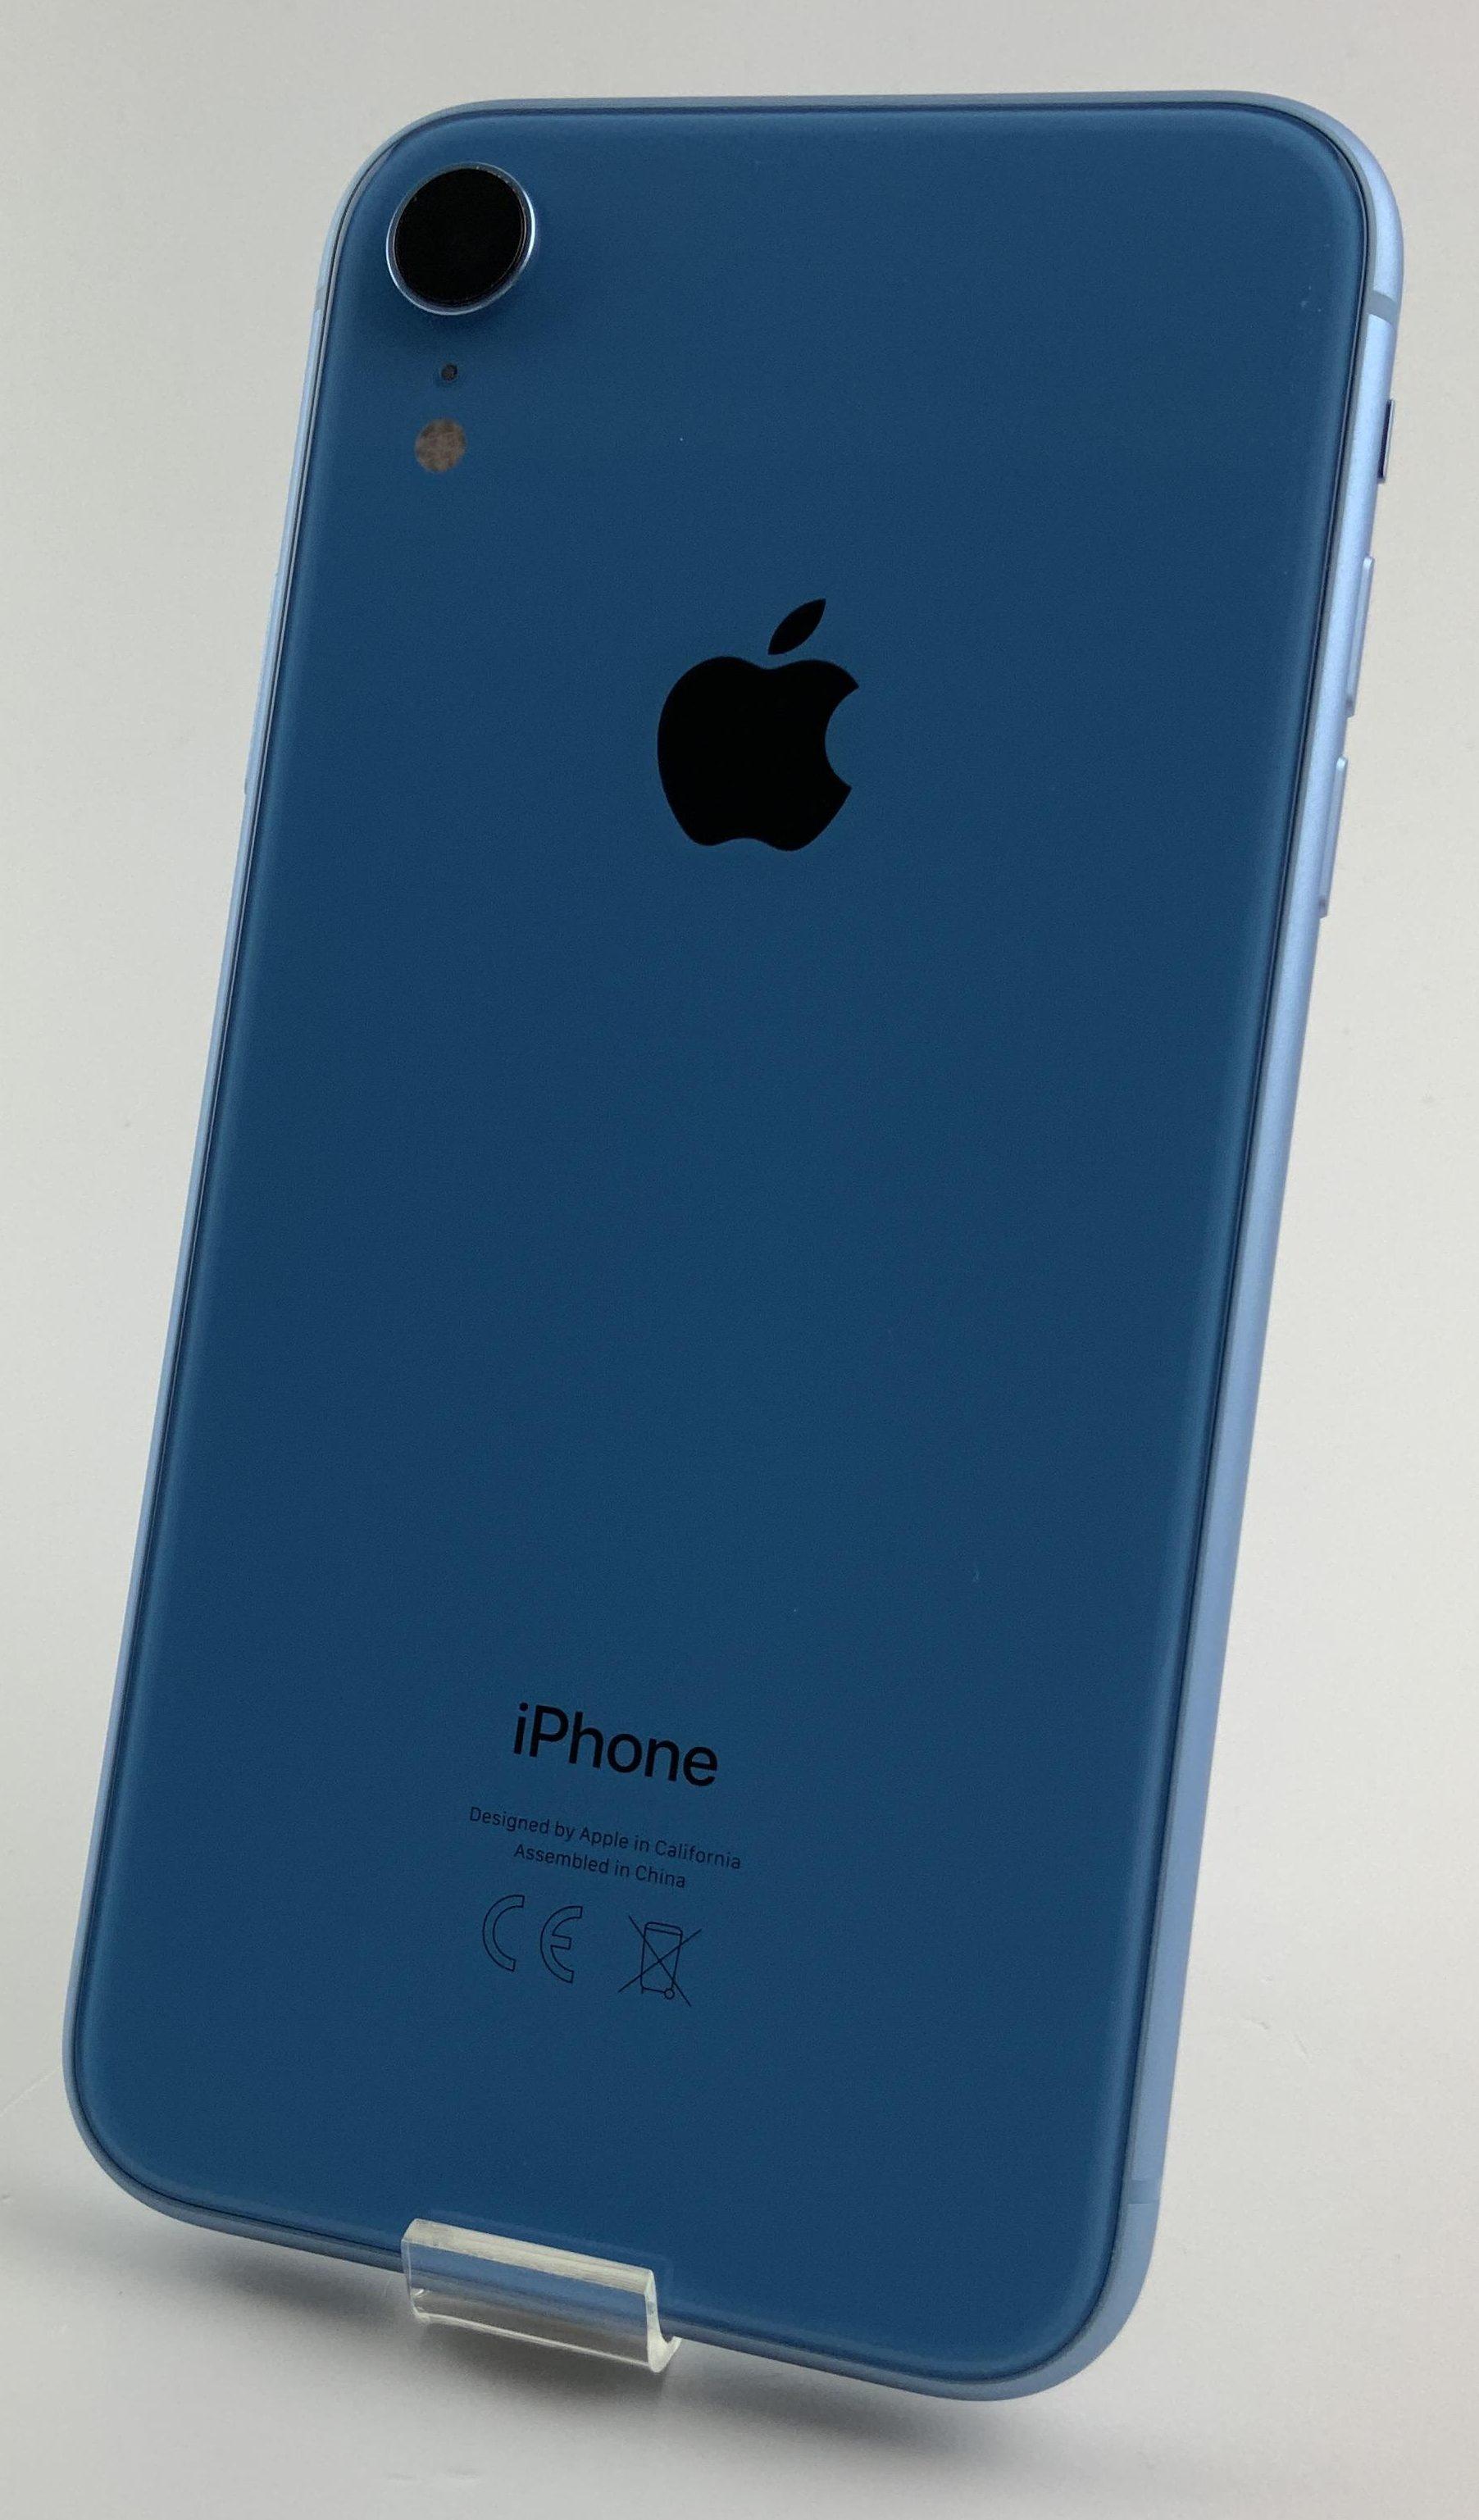 iPhone XR 64GB, 64GB, Blue, immagine 2